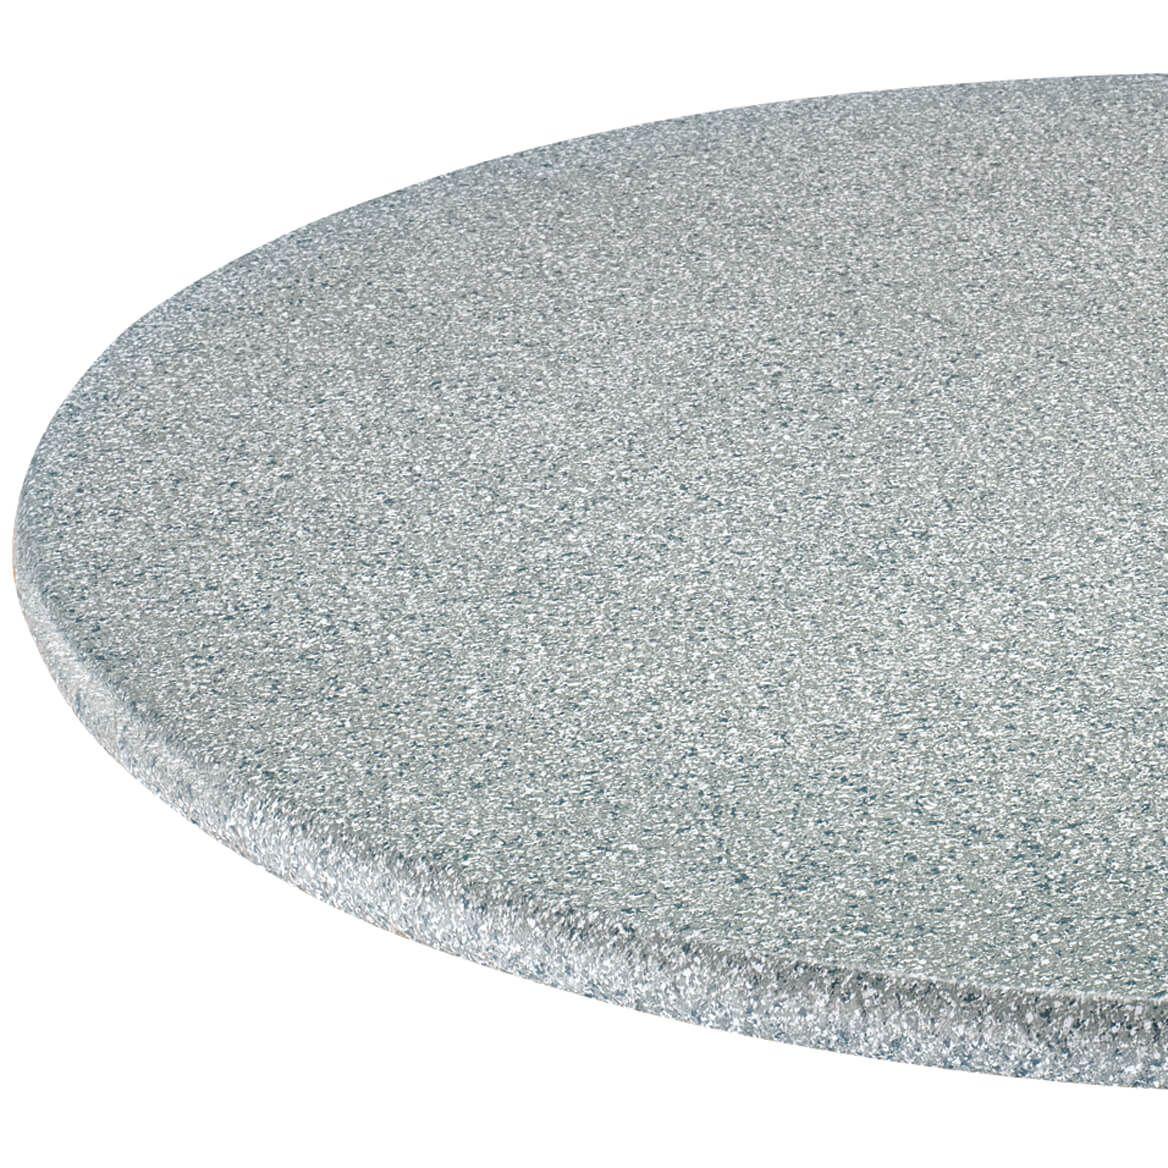 Granite Vinyl Elasticized Table Cover-344600